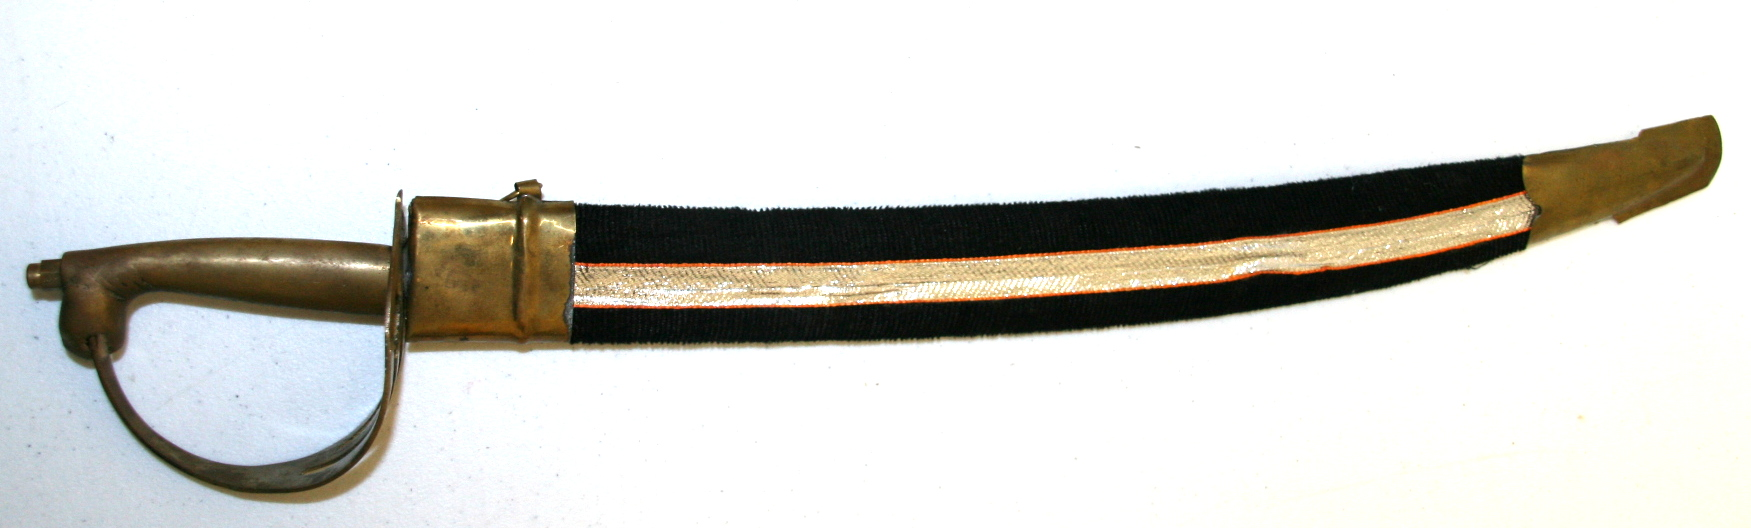 Made In India Very Rare Mini Sword 17 Brass Handle Circa